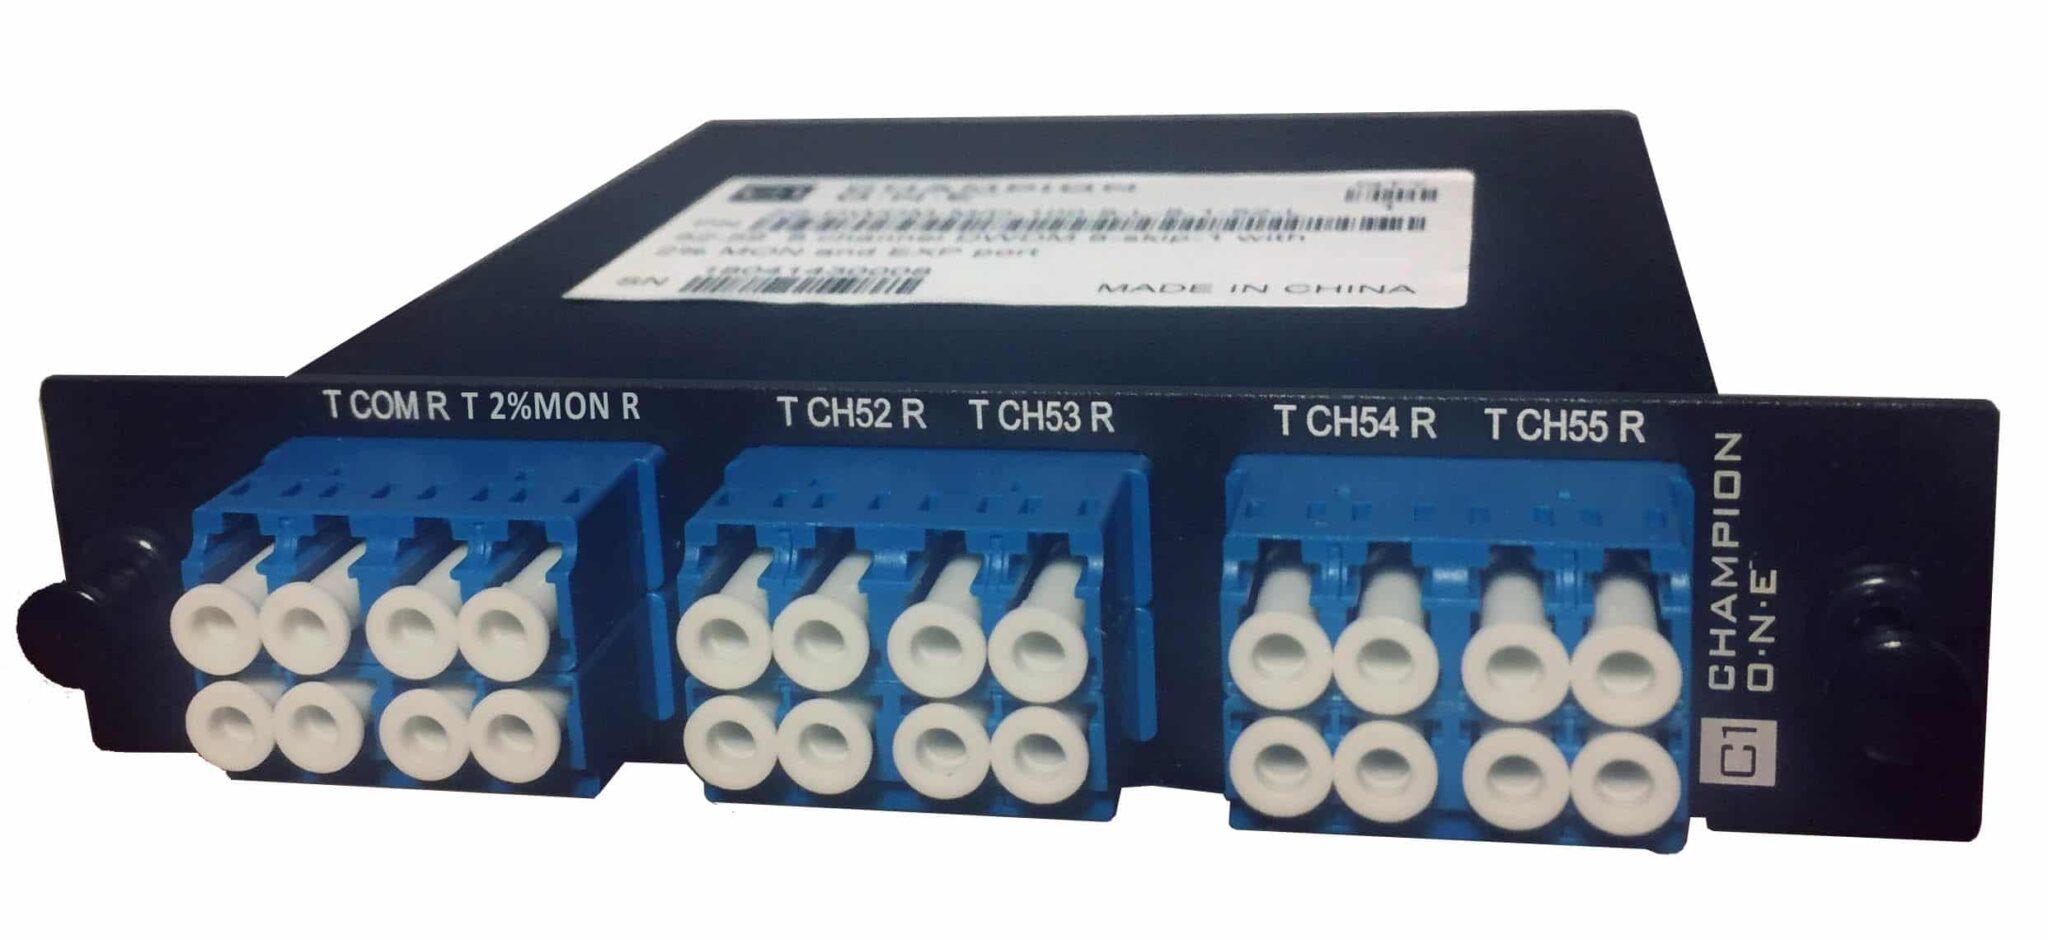 8 Channel DWDM Mux/Demux, ch. 52-59, LGX Enclosure